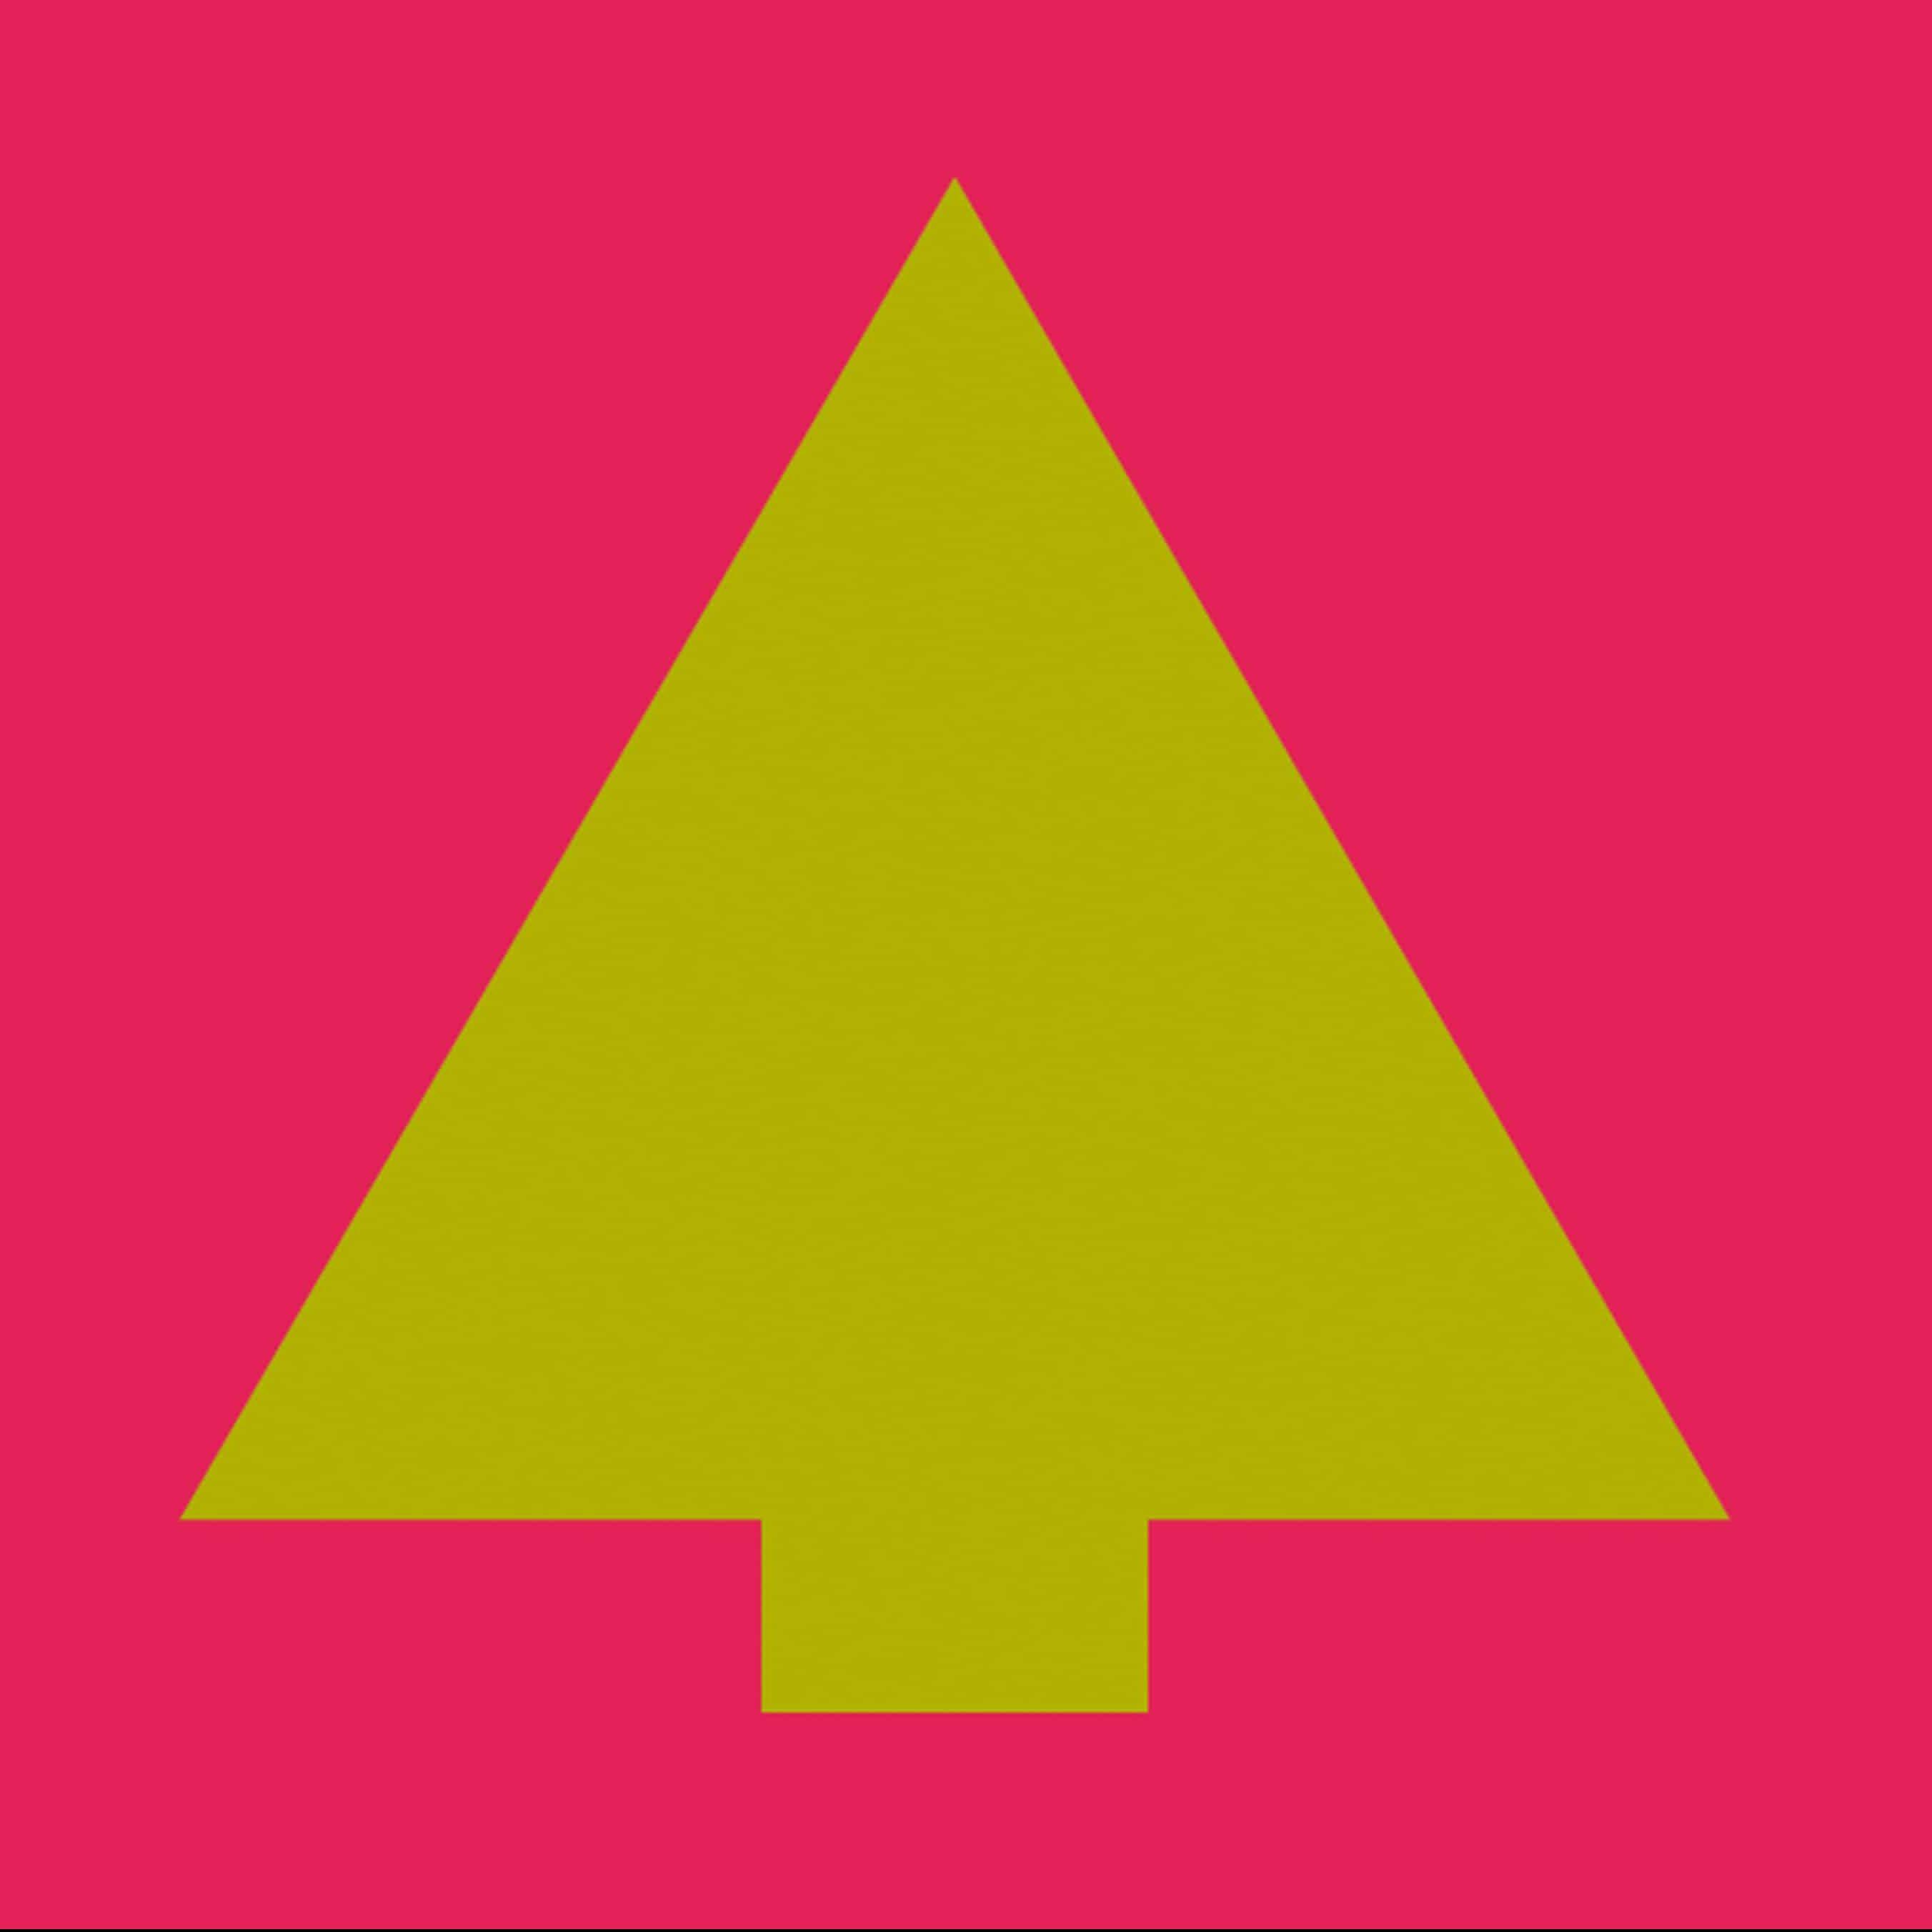 Xmas card design for konstructive